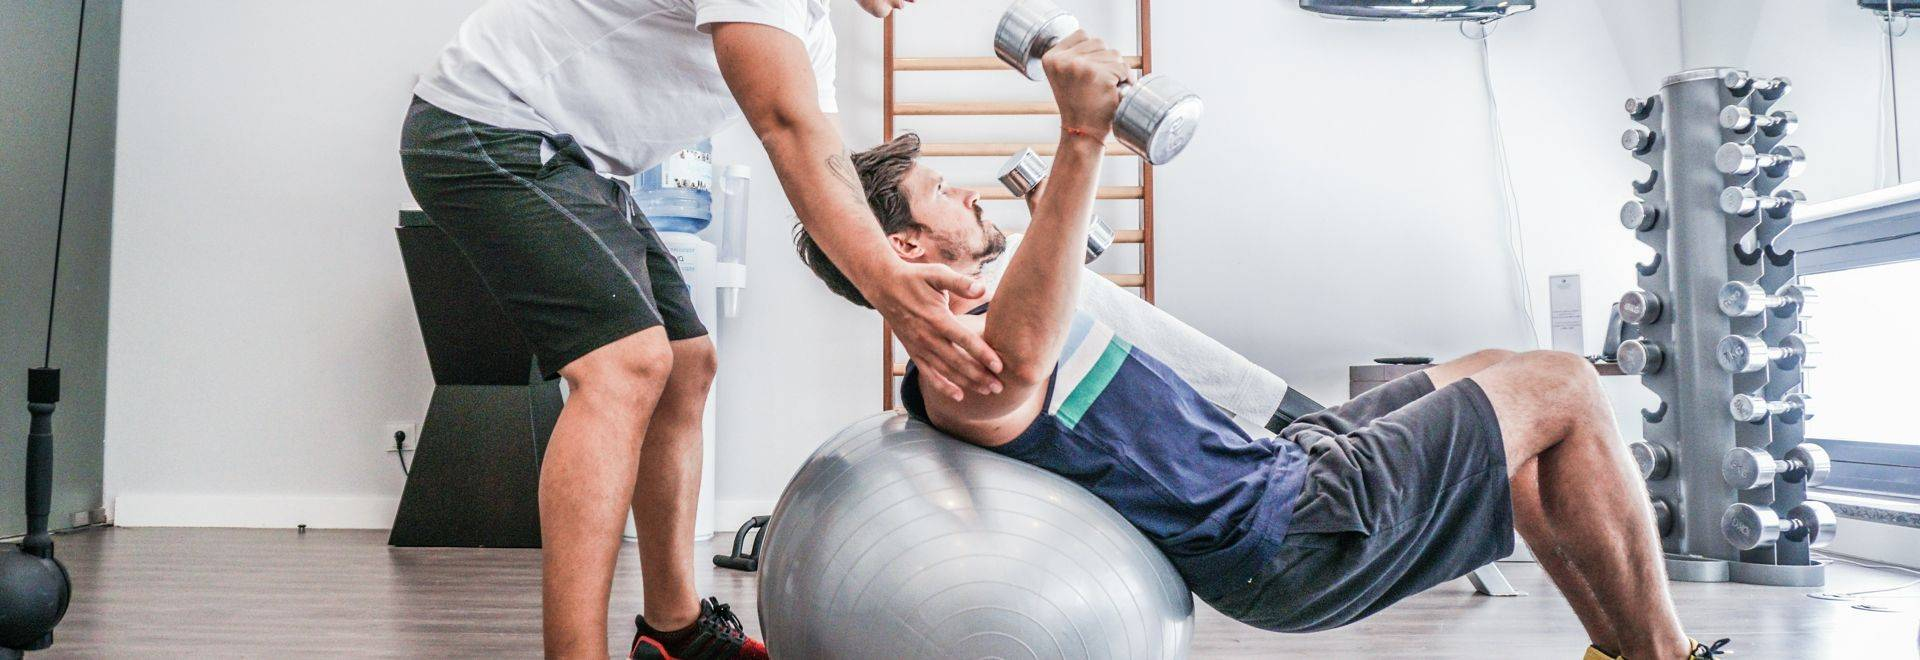 Macdonald-Monchique-fitnes-training-3.jpg